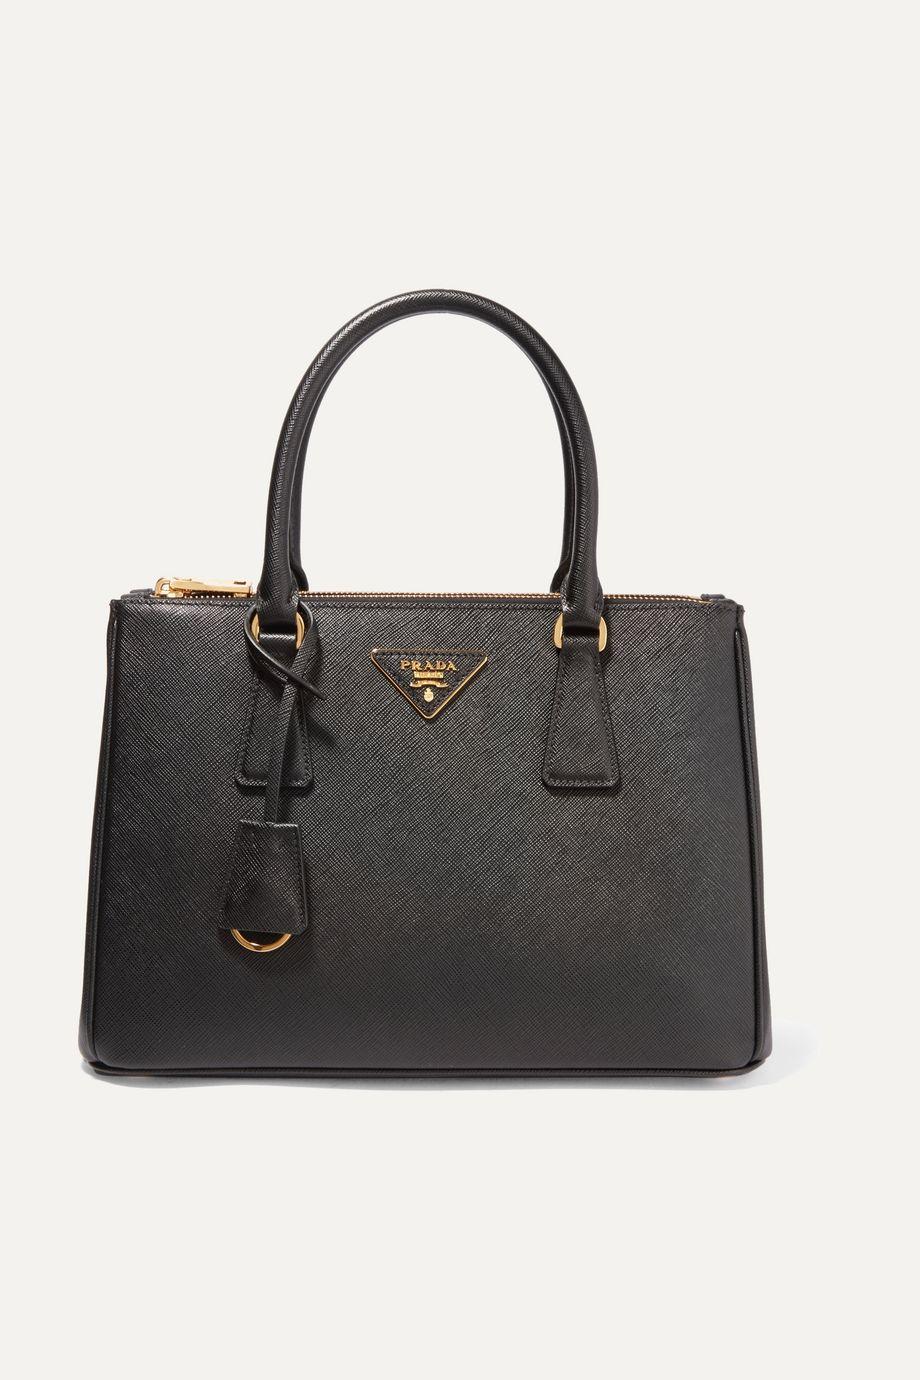 Prada Galleria small textured-leather tote